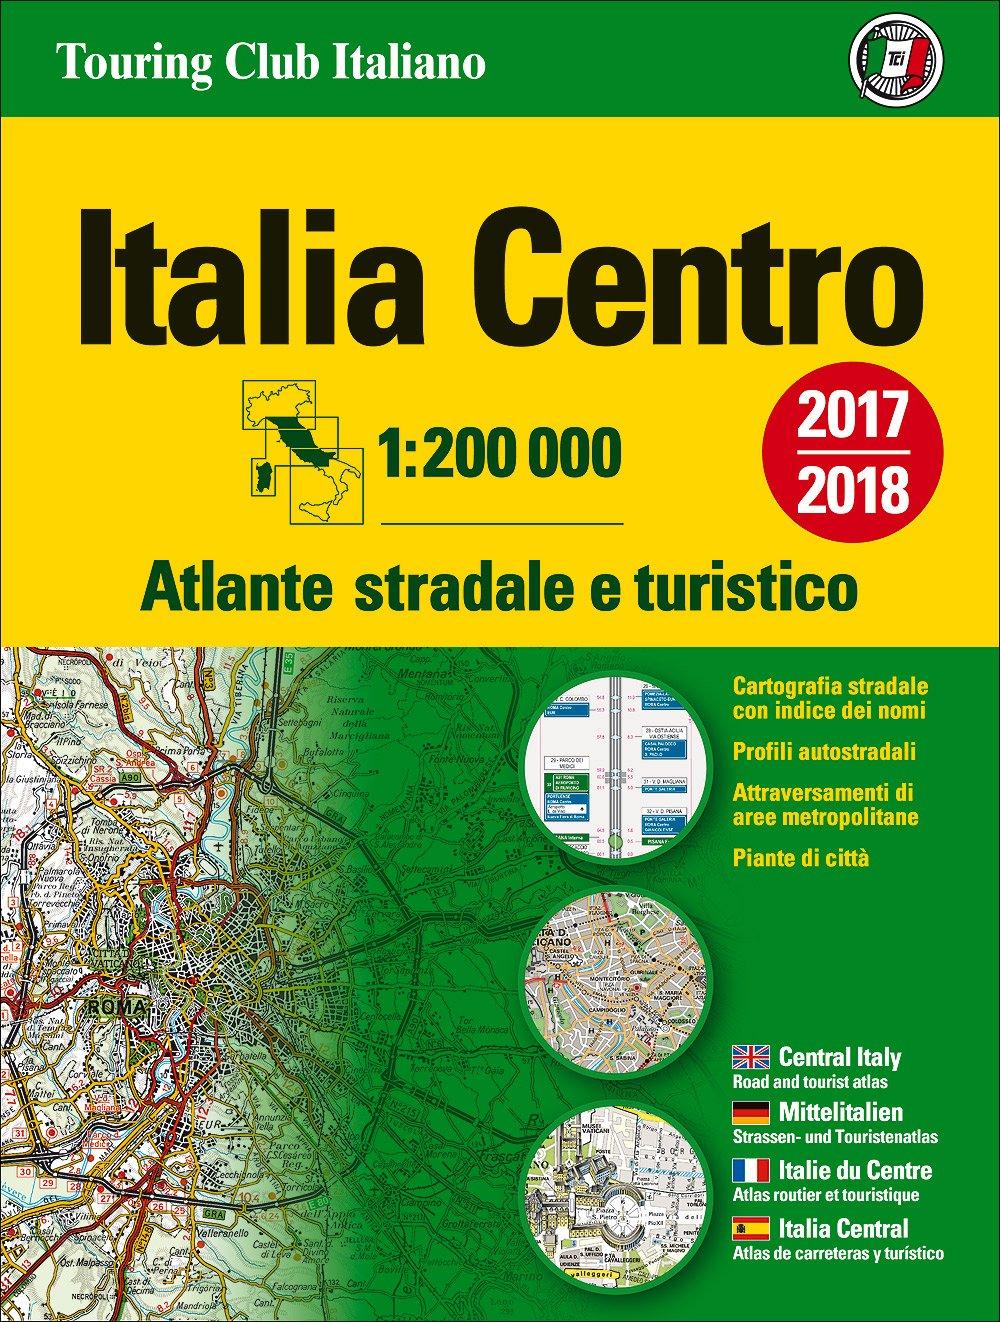 Italy Central Atlas - Atlante Stradale Centro: TCI.A2